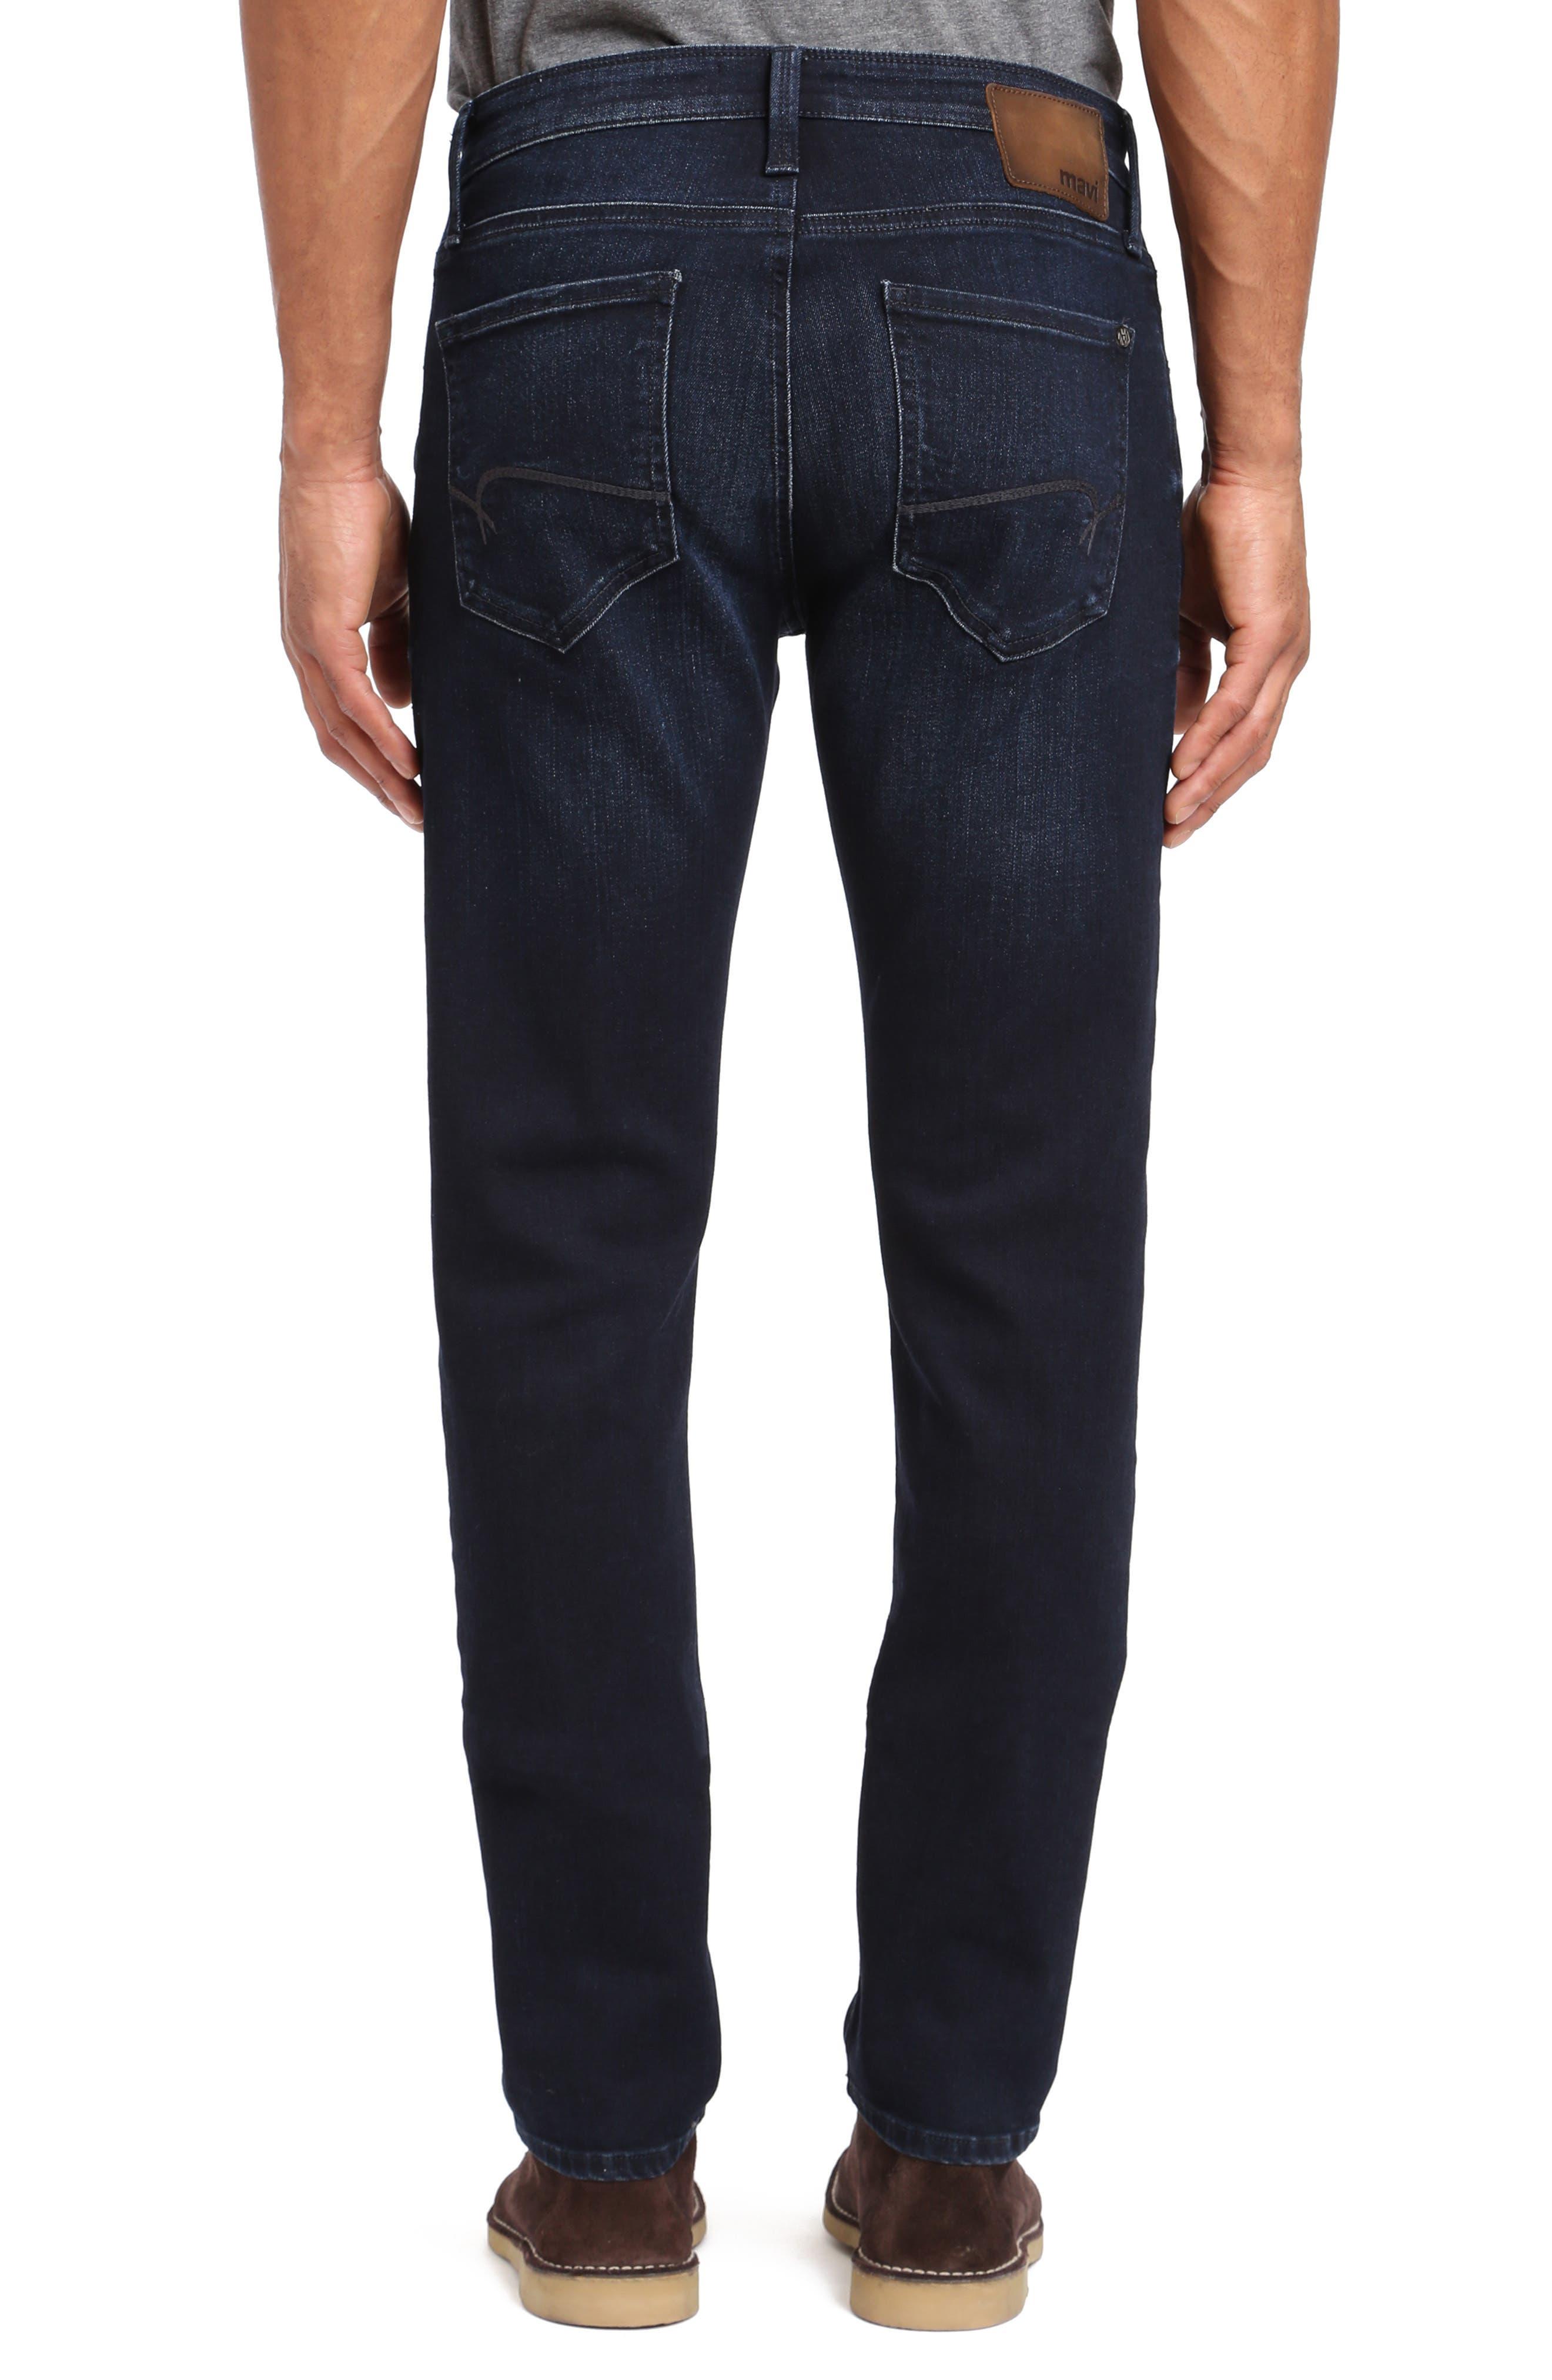 Jake Skinny Fit Jeans,                             Alternate thumbnail 2, color,                             INK FOGGY WILLIAMSBURG